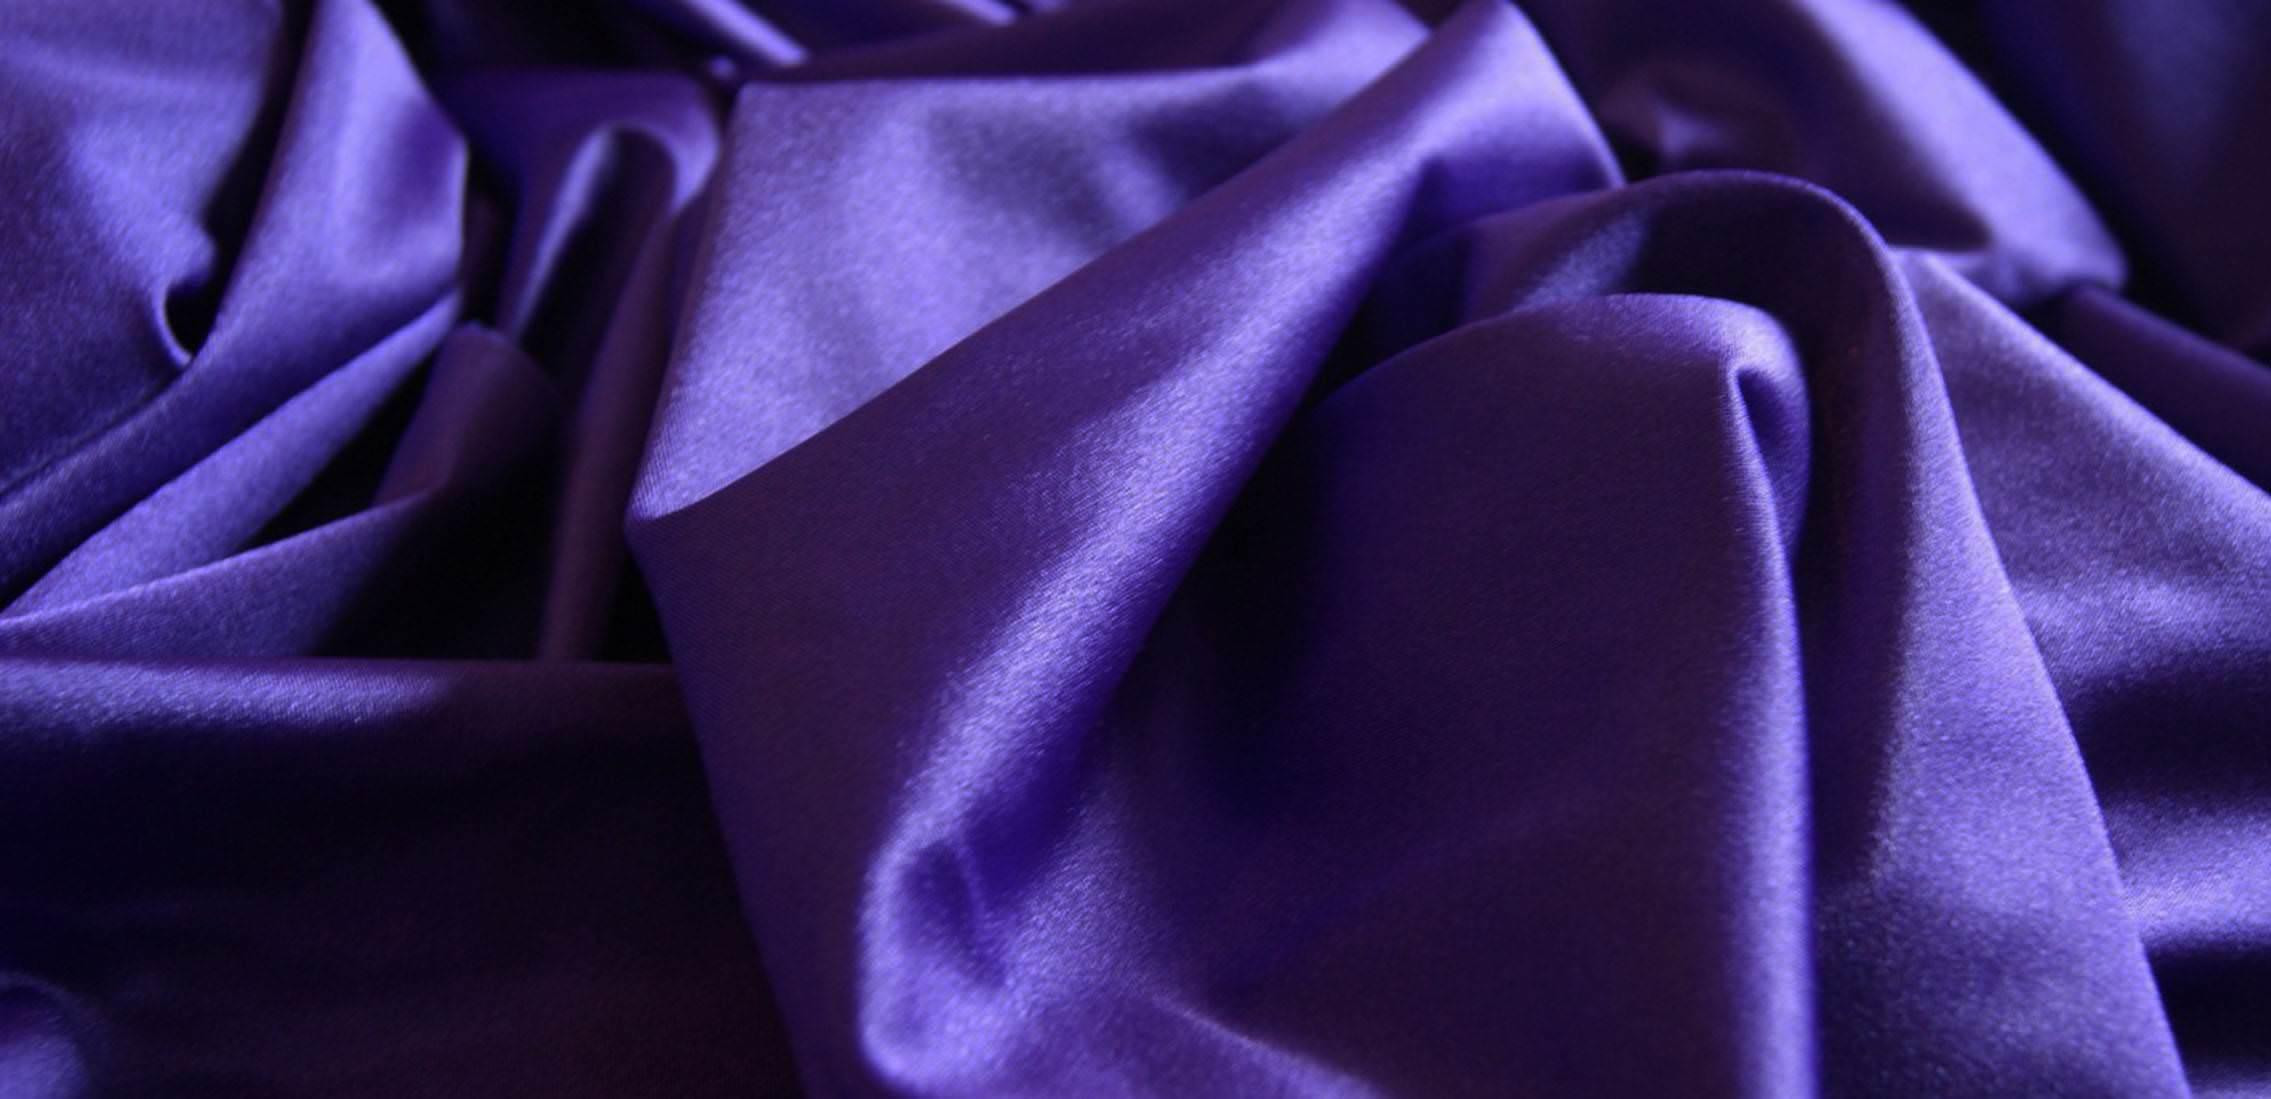 lycra stoffe gl nzend kaufen 17 farben ab 6 50. Black Bedroom Furniture Sets. Home Design Ideas